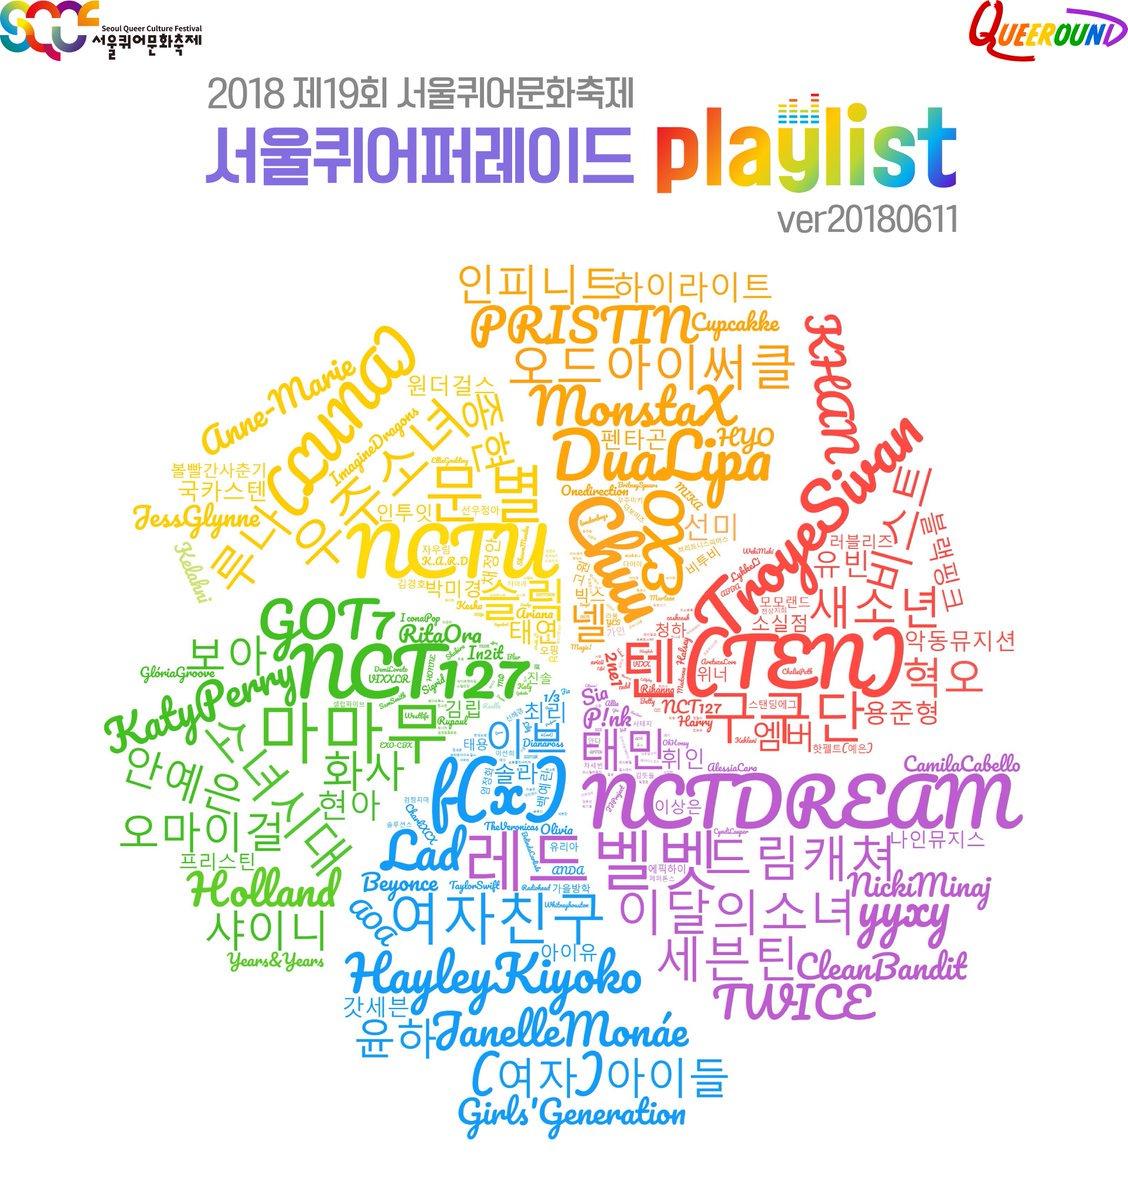 playlist got7